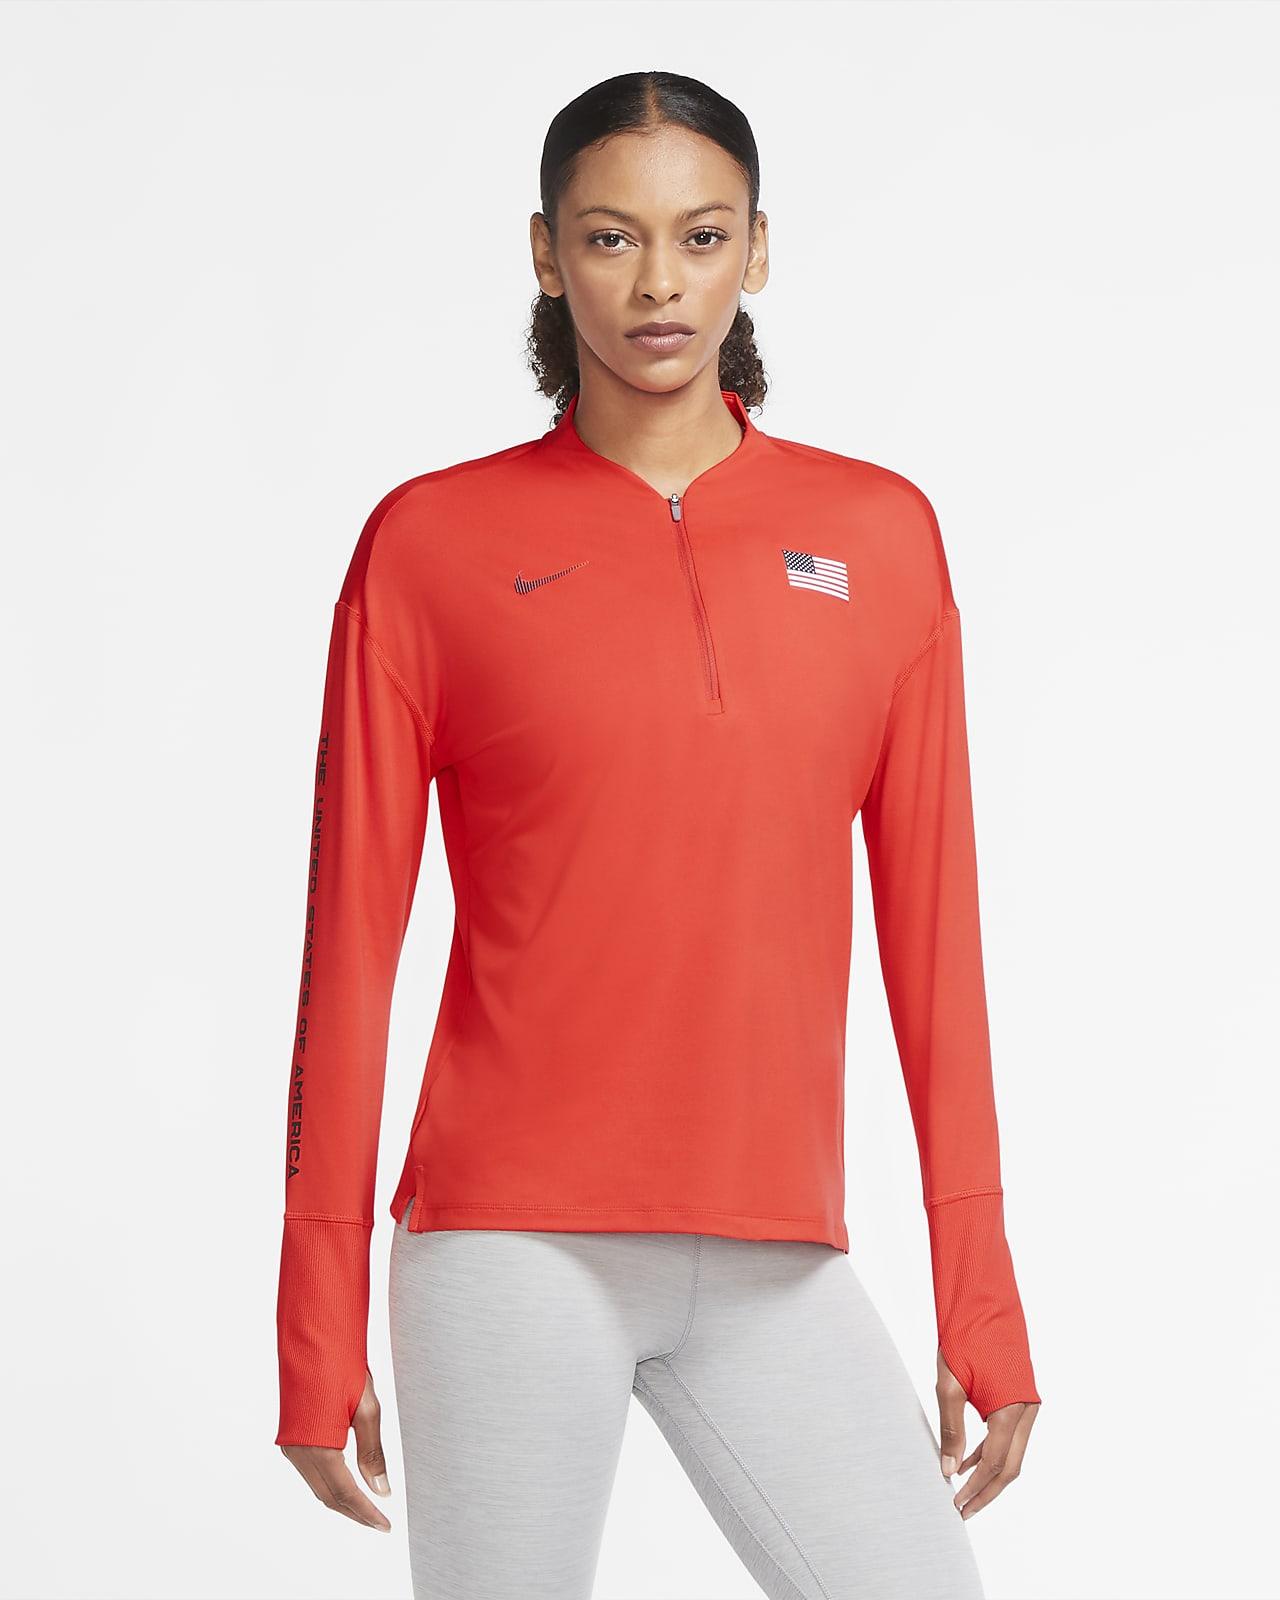 Nike Team USA Women's 1/2-Zip Running Top